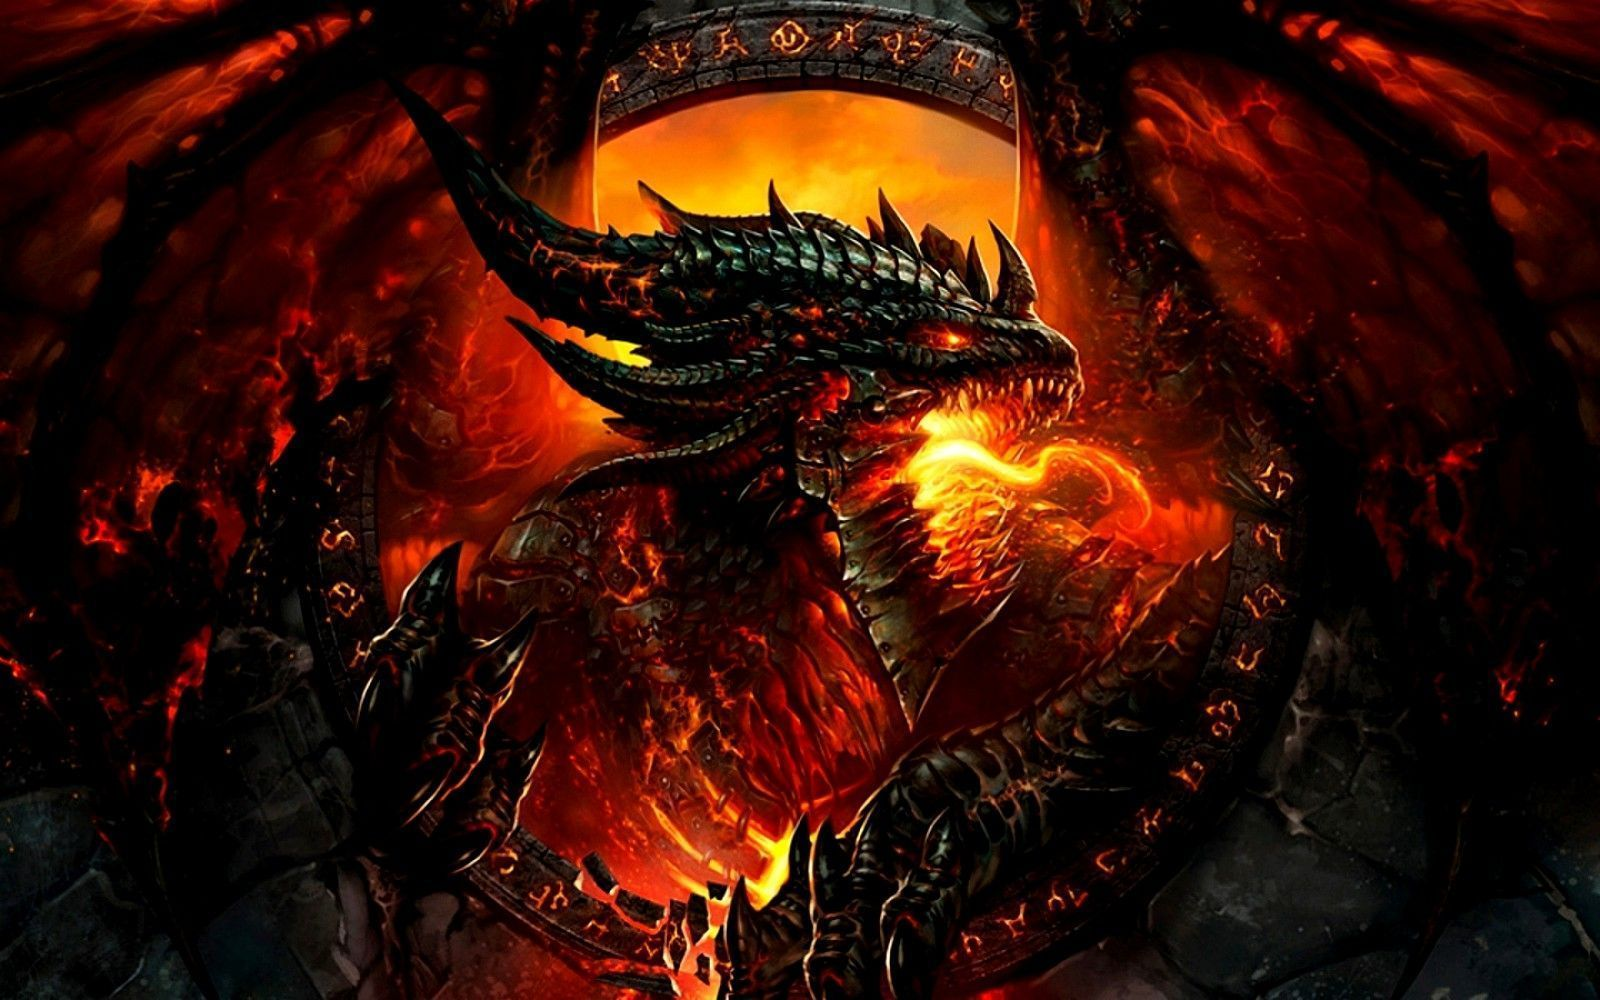 3d Dragon Wallpapers Wallpaper Cave In 2019 Dragon